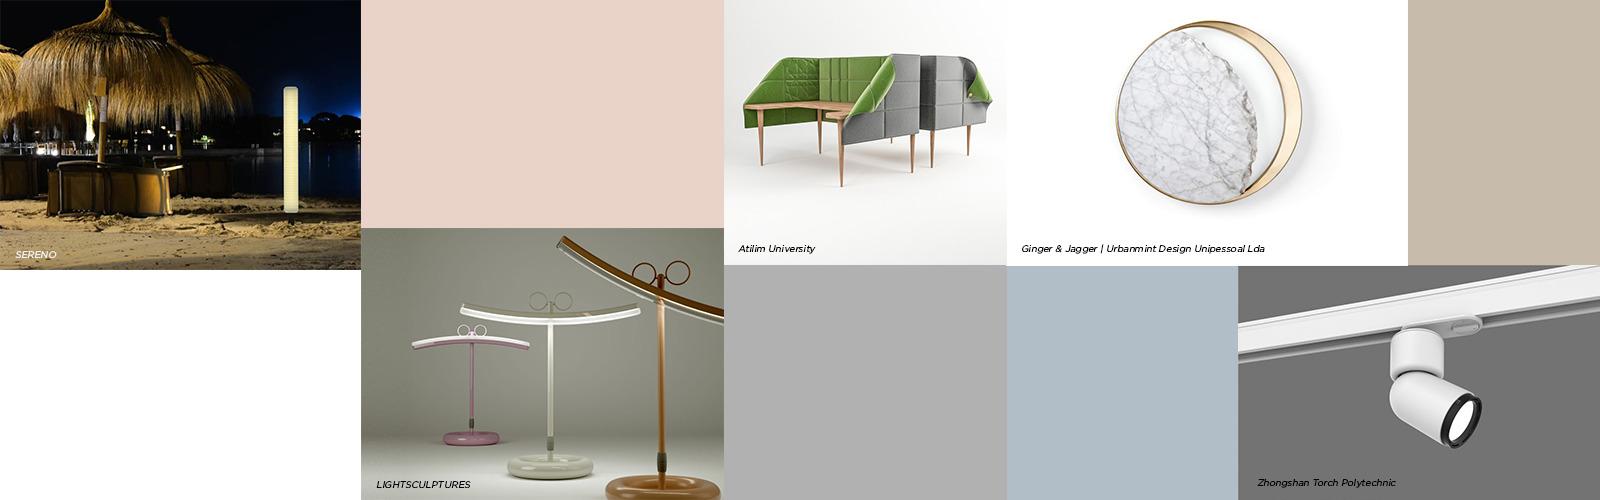 SIT Furniture Design Award™ - Categories